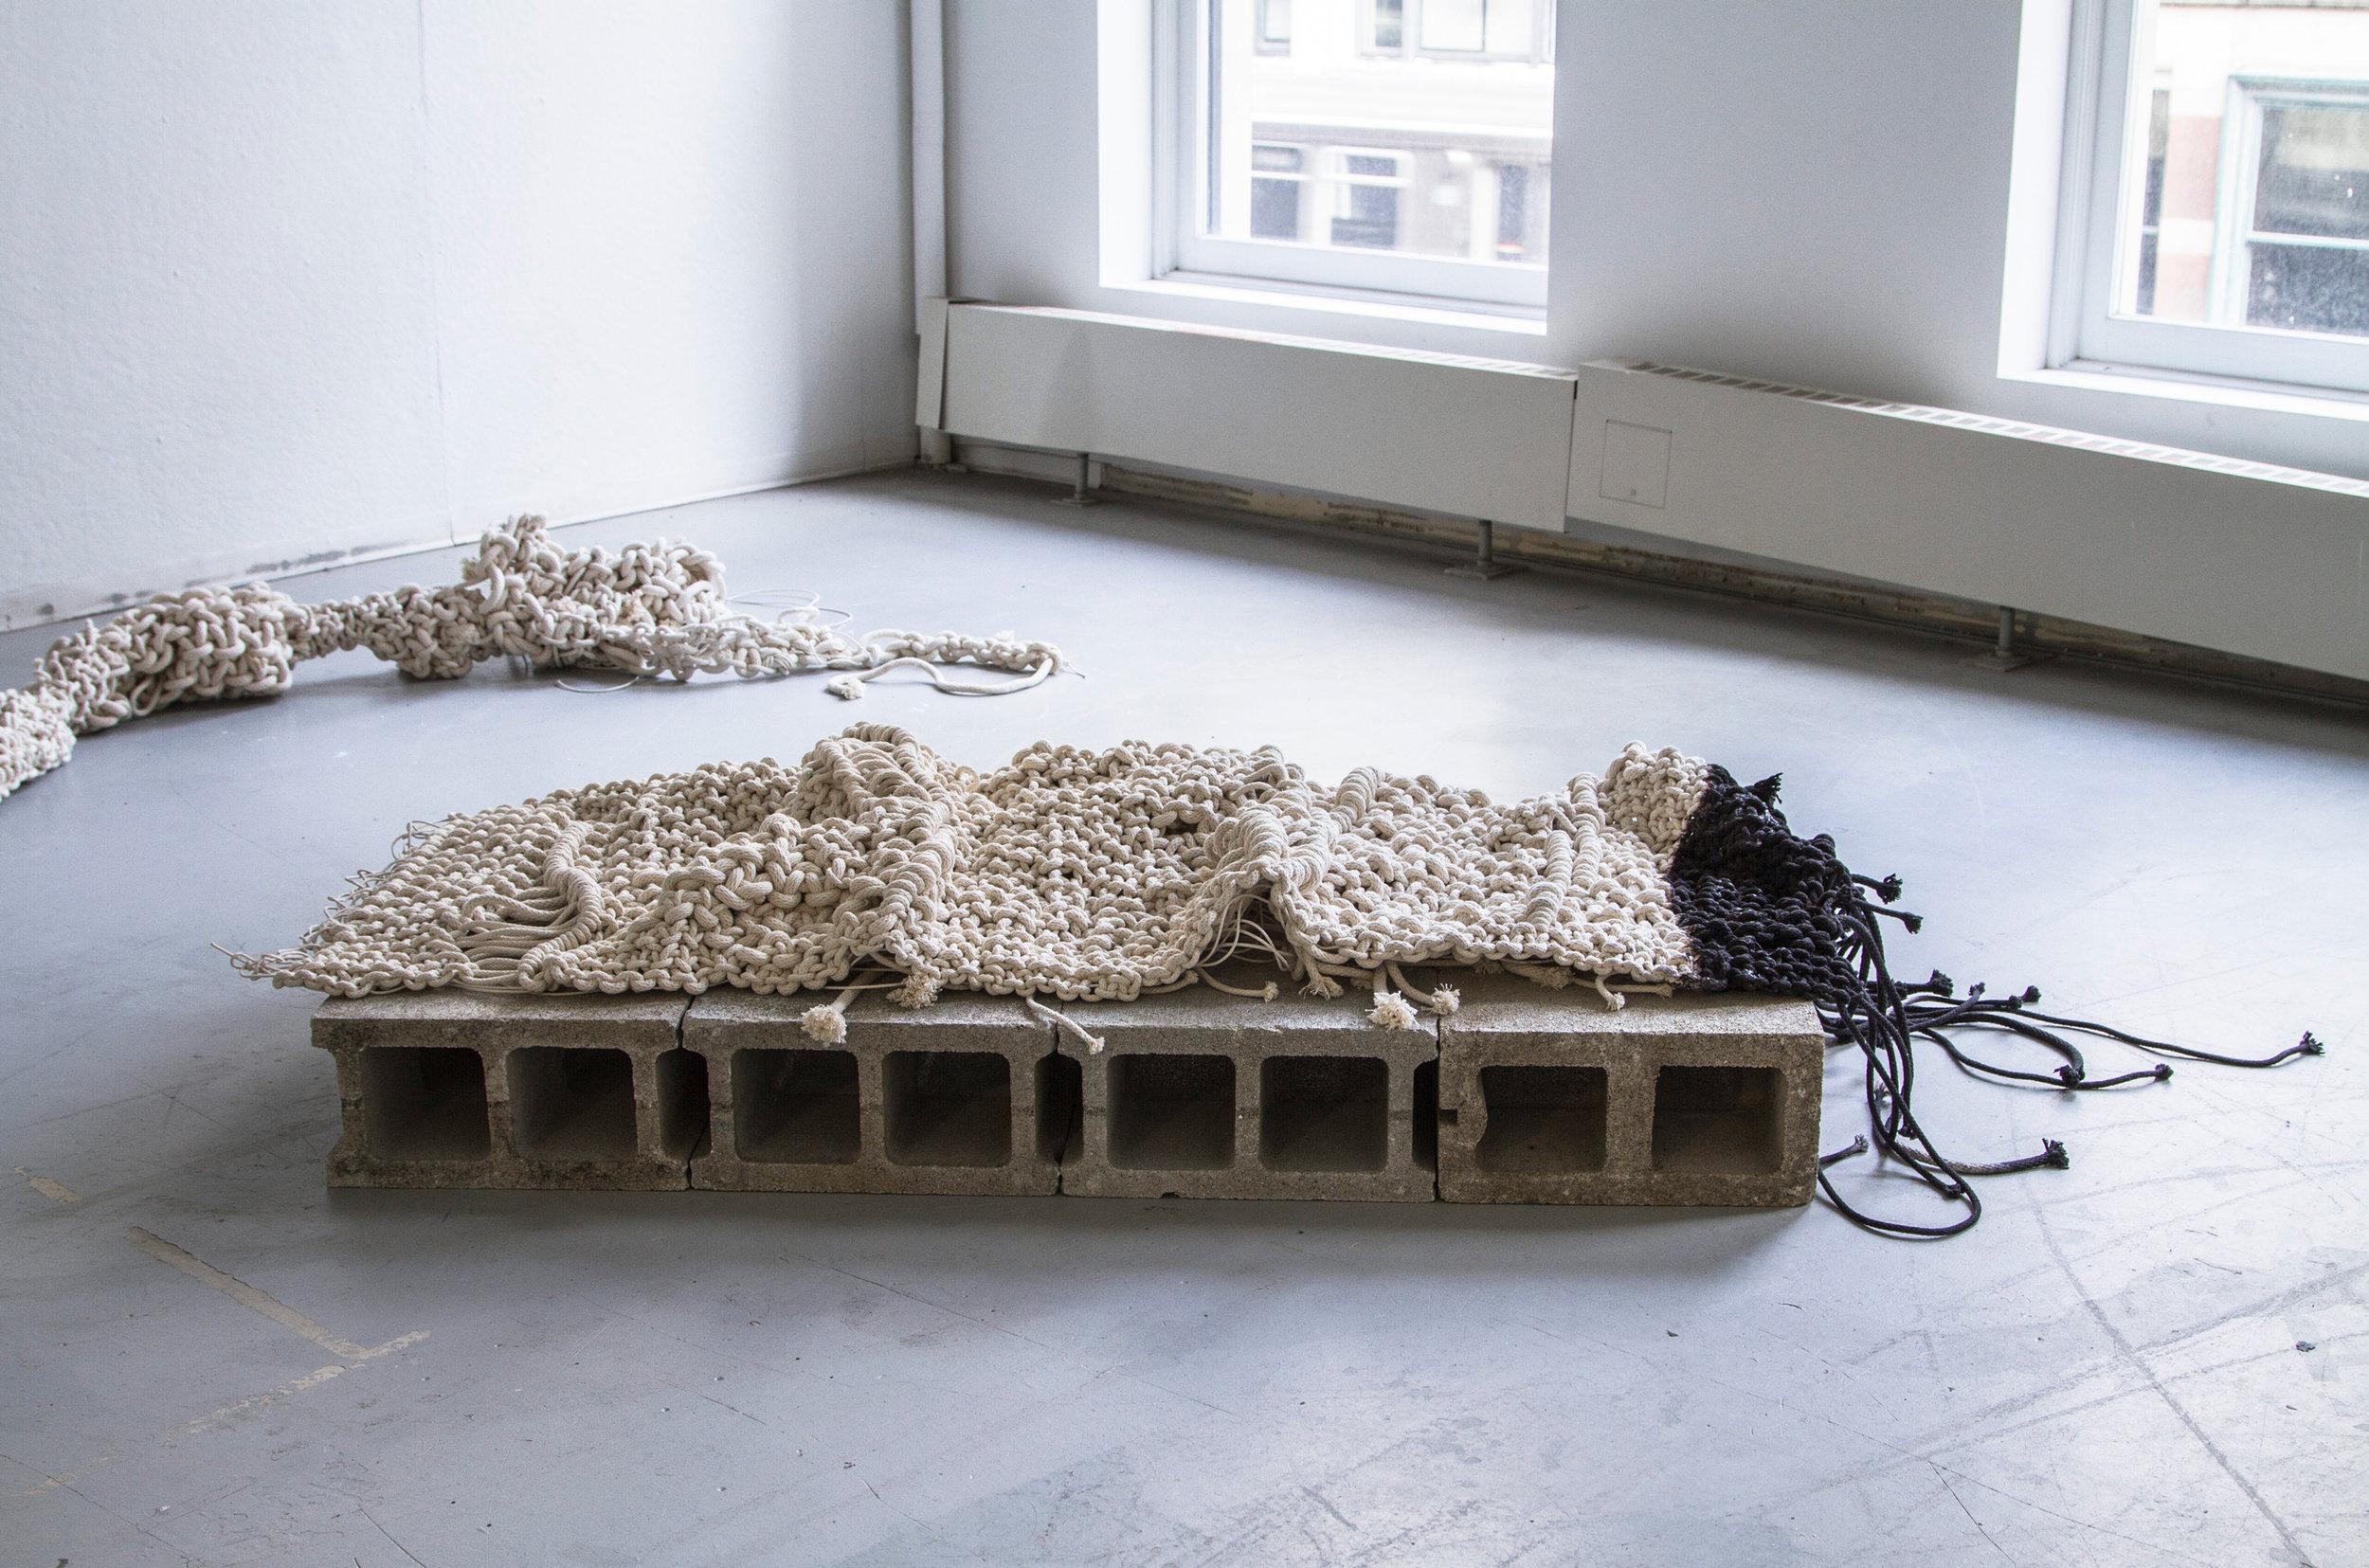 Jacqueline-Surdell-Artist-Sculpture-The-Process-of-Building-02.jpg